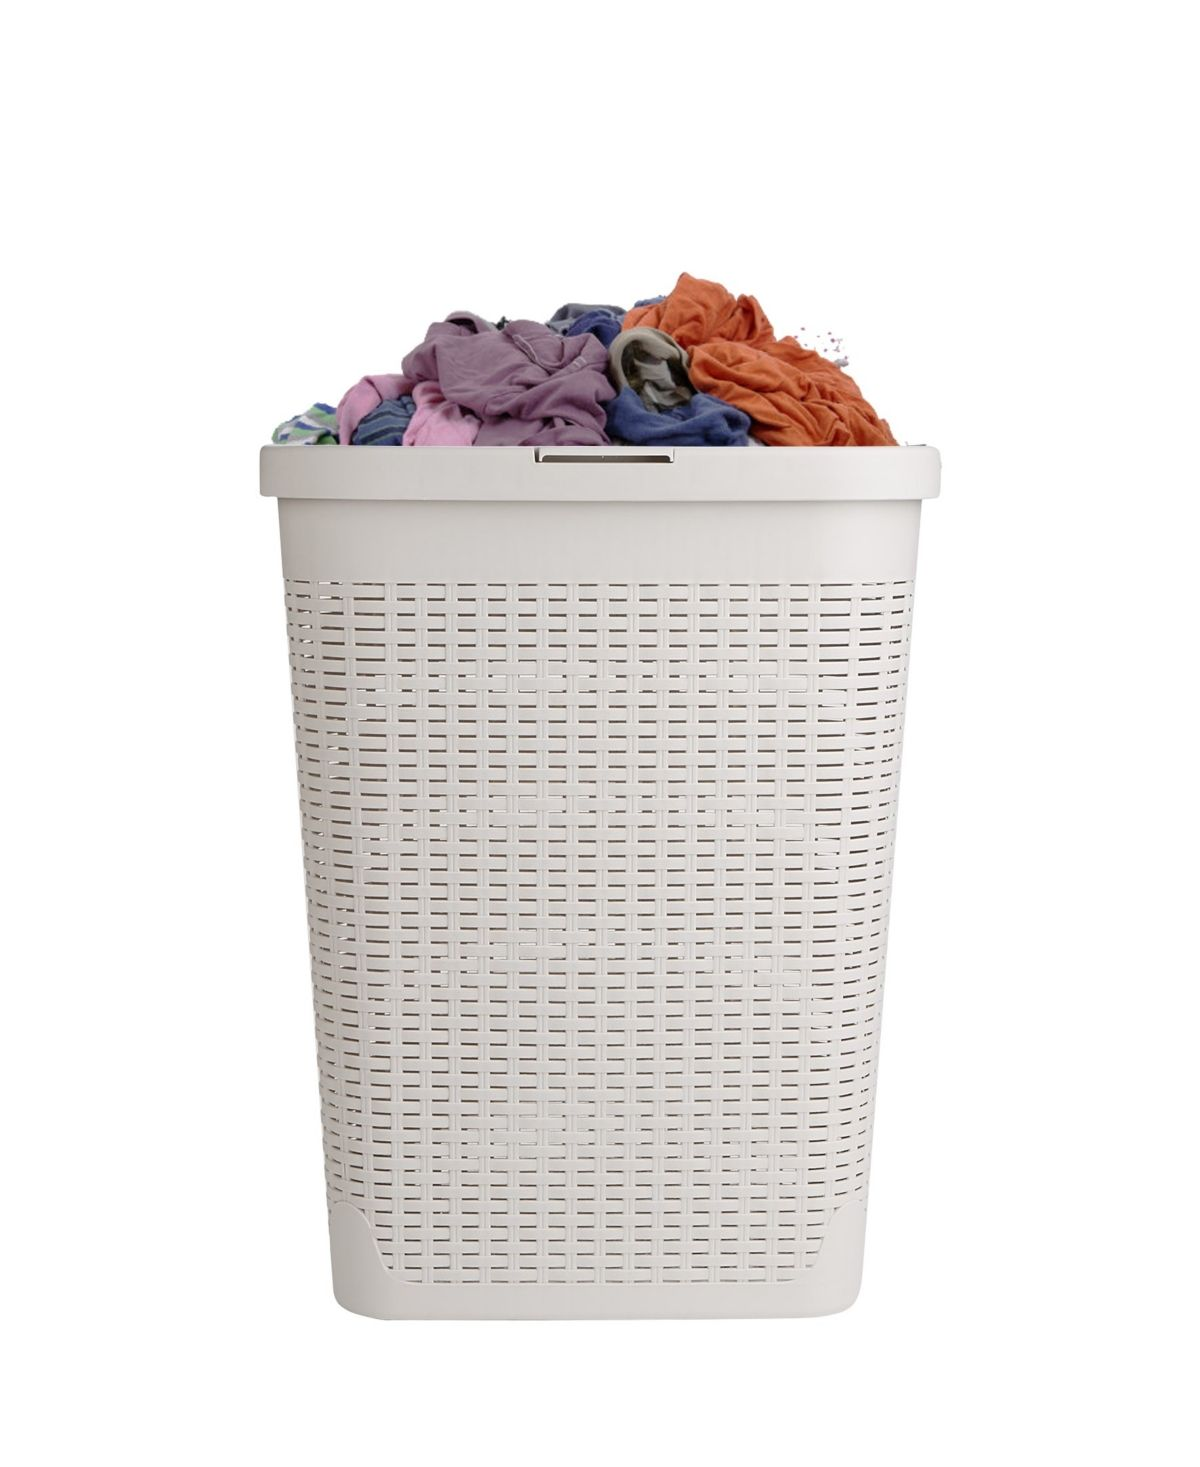 Mind Reader Slim Laundry Basket Reviews Cleaning